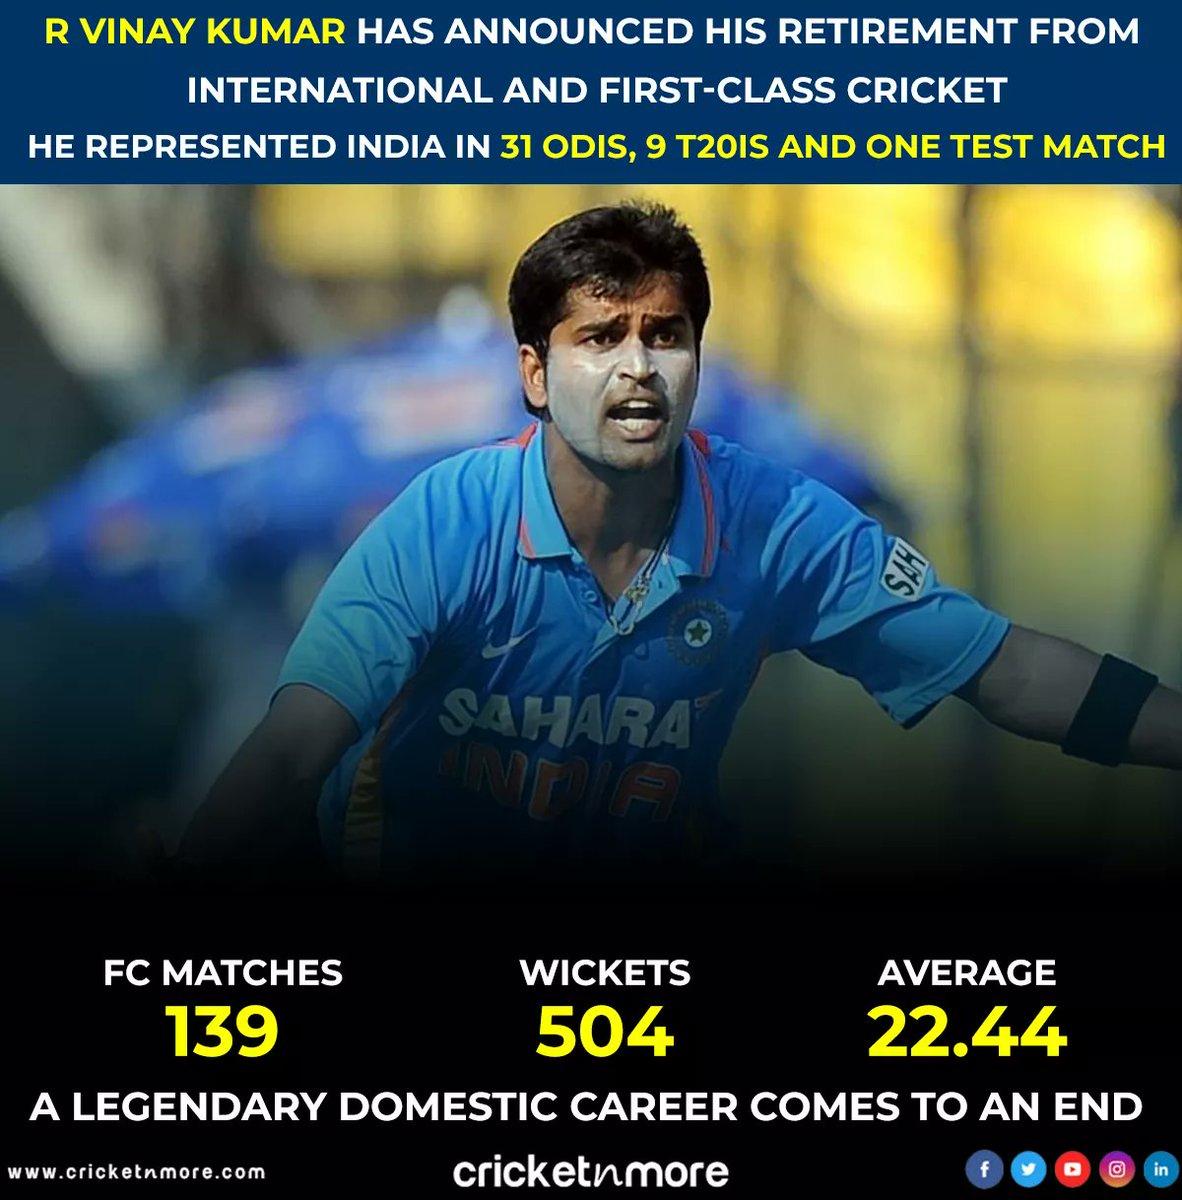 Congratulations on a wonderful career @Vinay_Kumar_R . . #cricket #indiancricket #teamindia #vinaykumar #karnataka #ranjitrophy #vijayhazaretrophy #syedmushtaqalitrophy